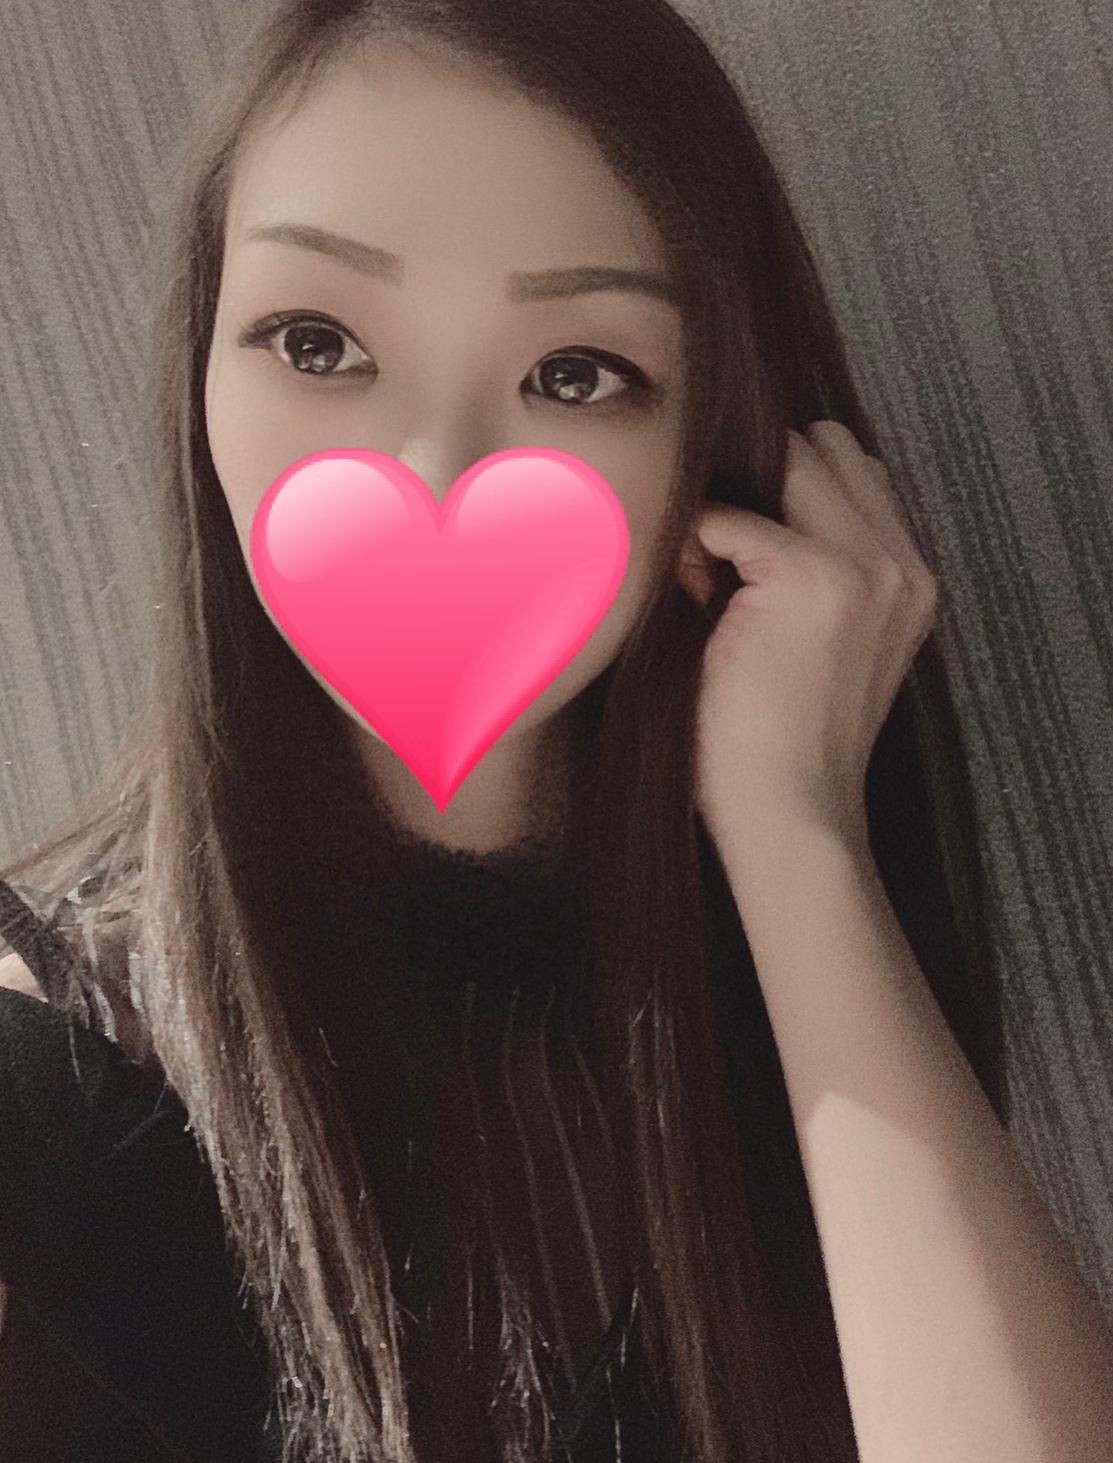 トモカ(新人)(29)